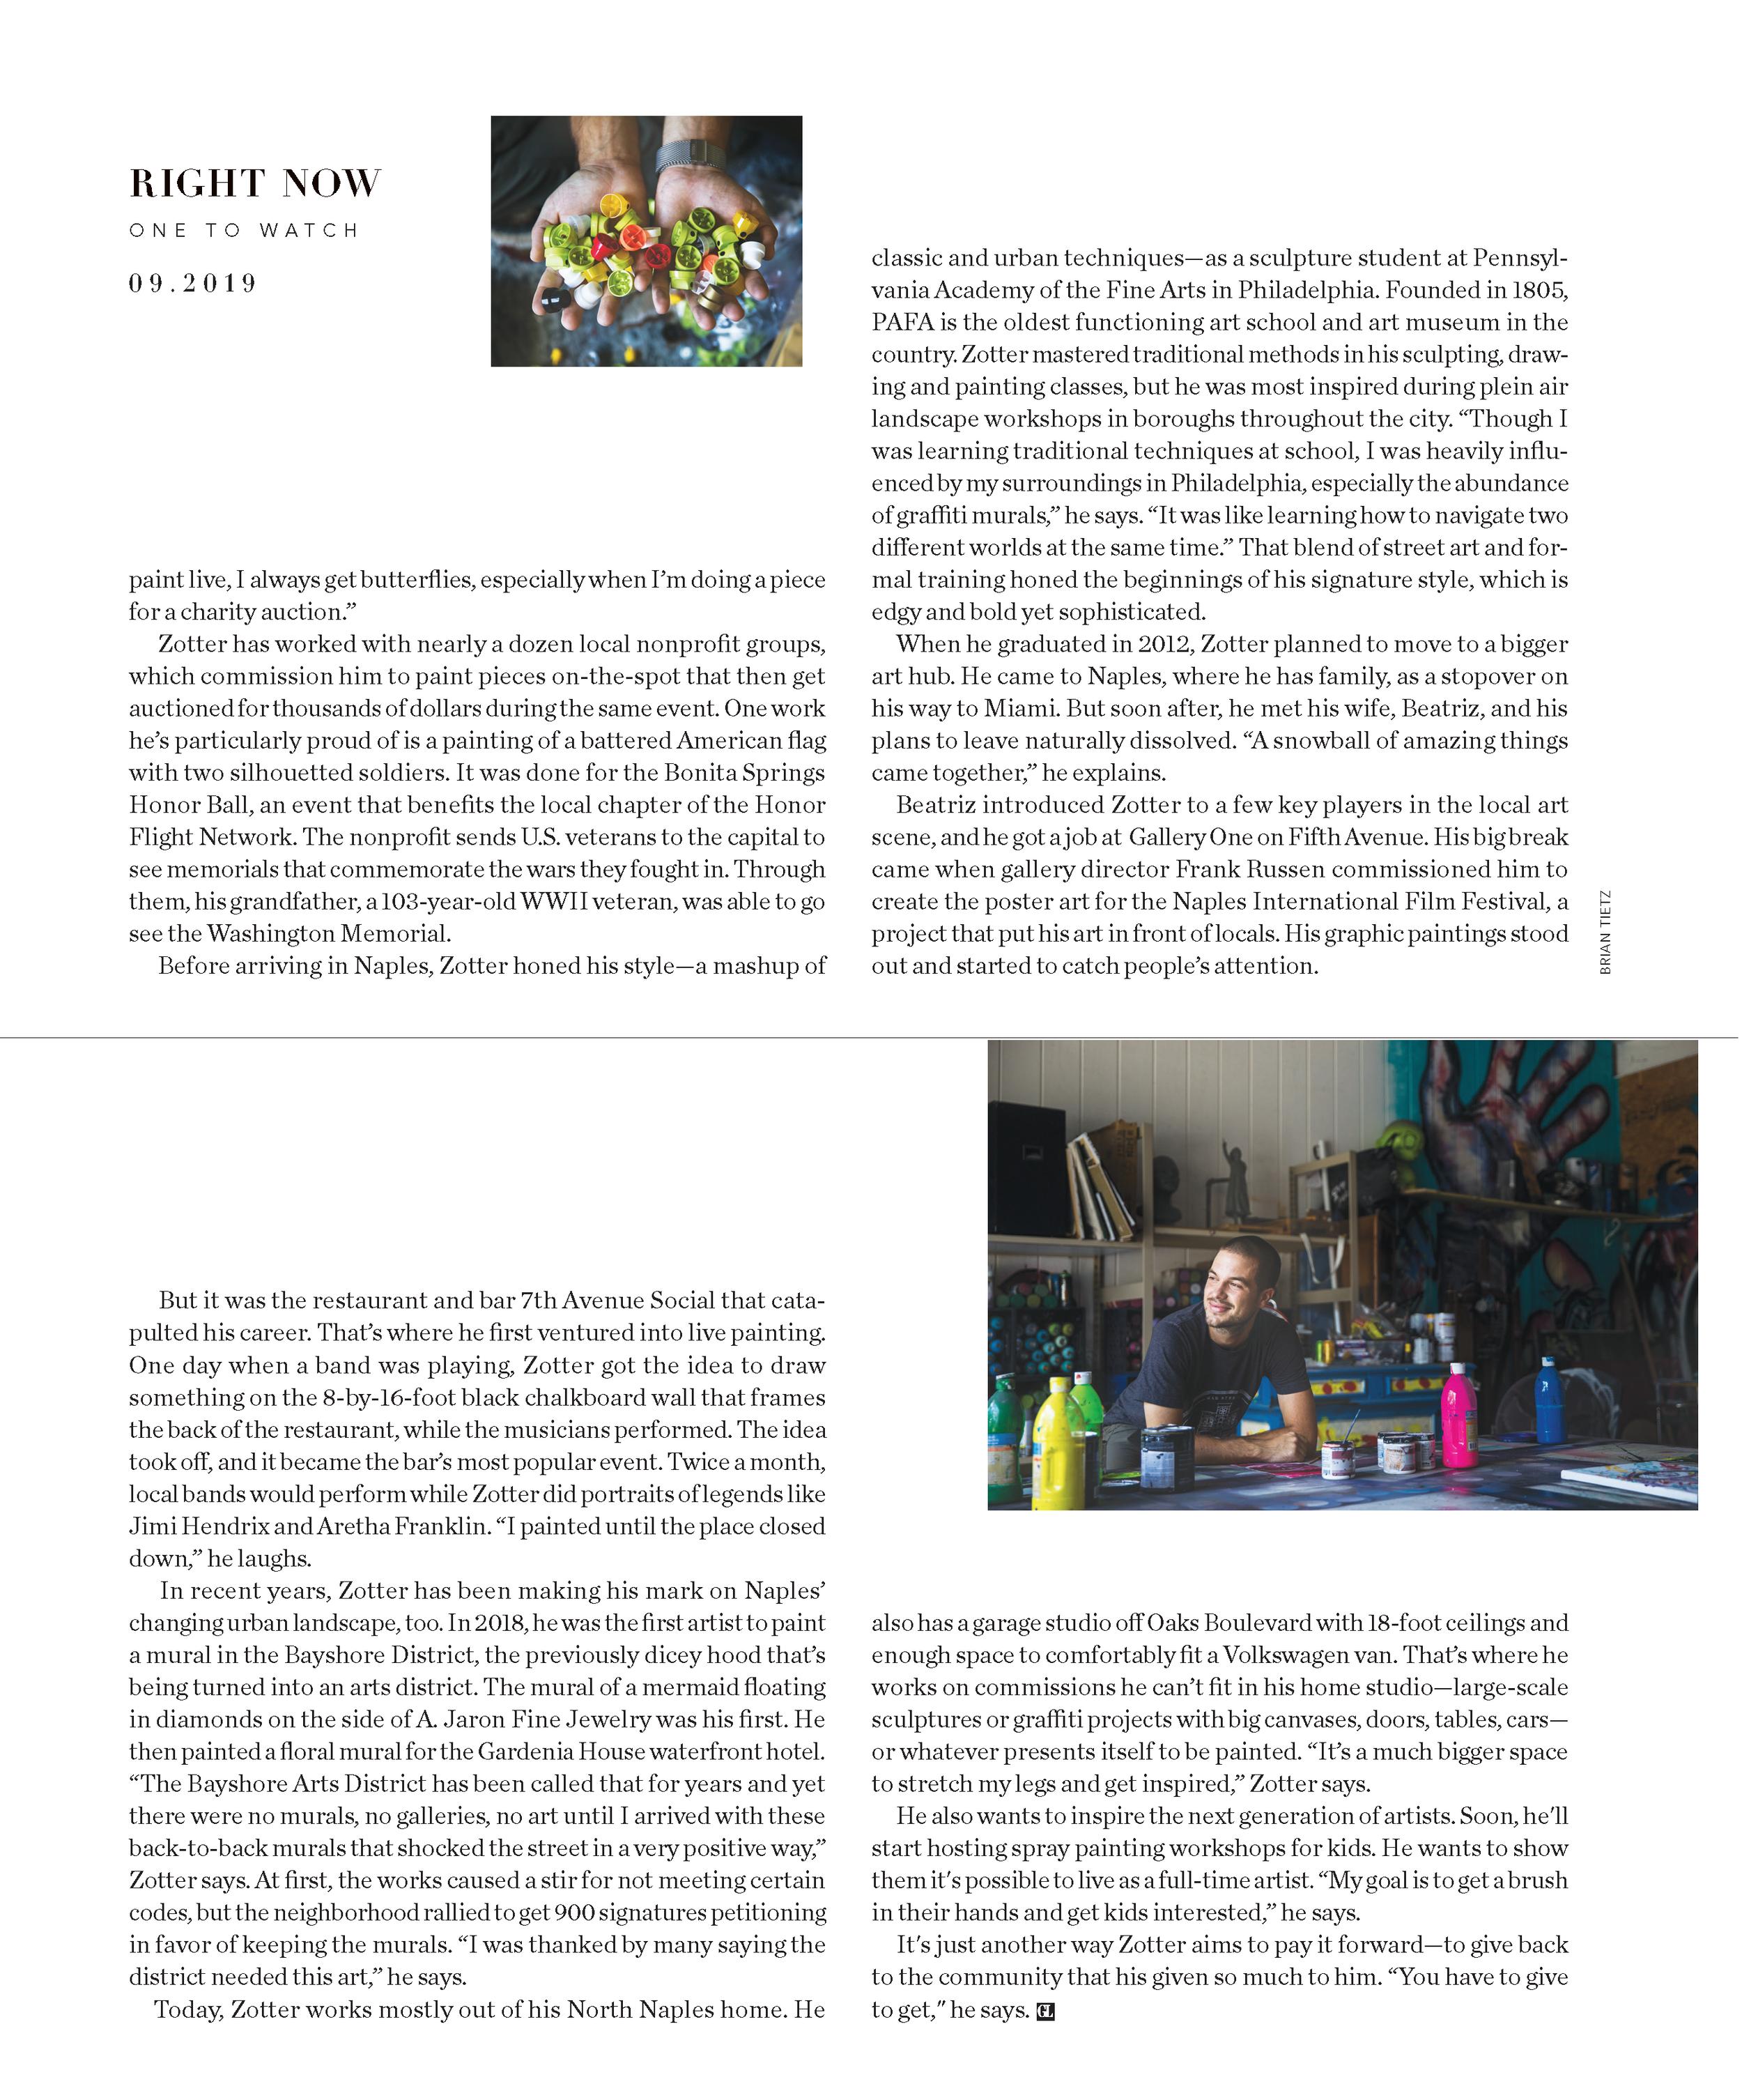 Edited_GL_SEPTEMBER19_032-035_RN_ARTIST SPOTLIGHT_Page_2.png